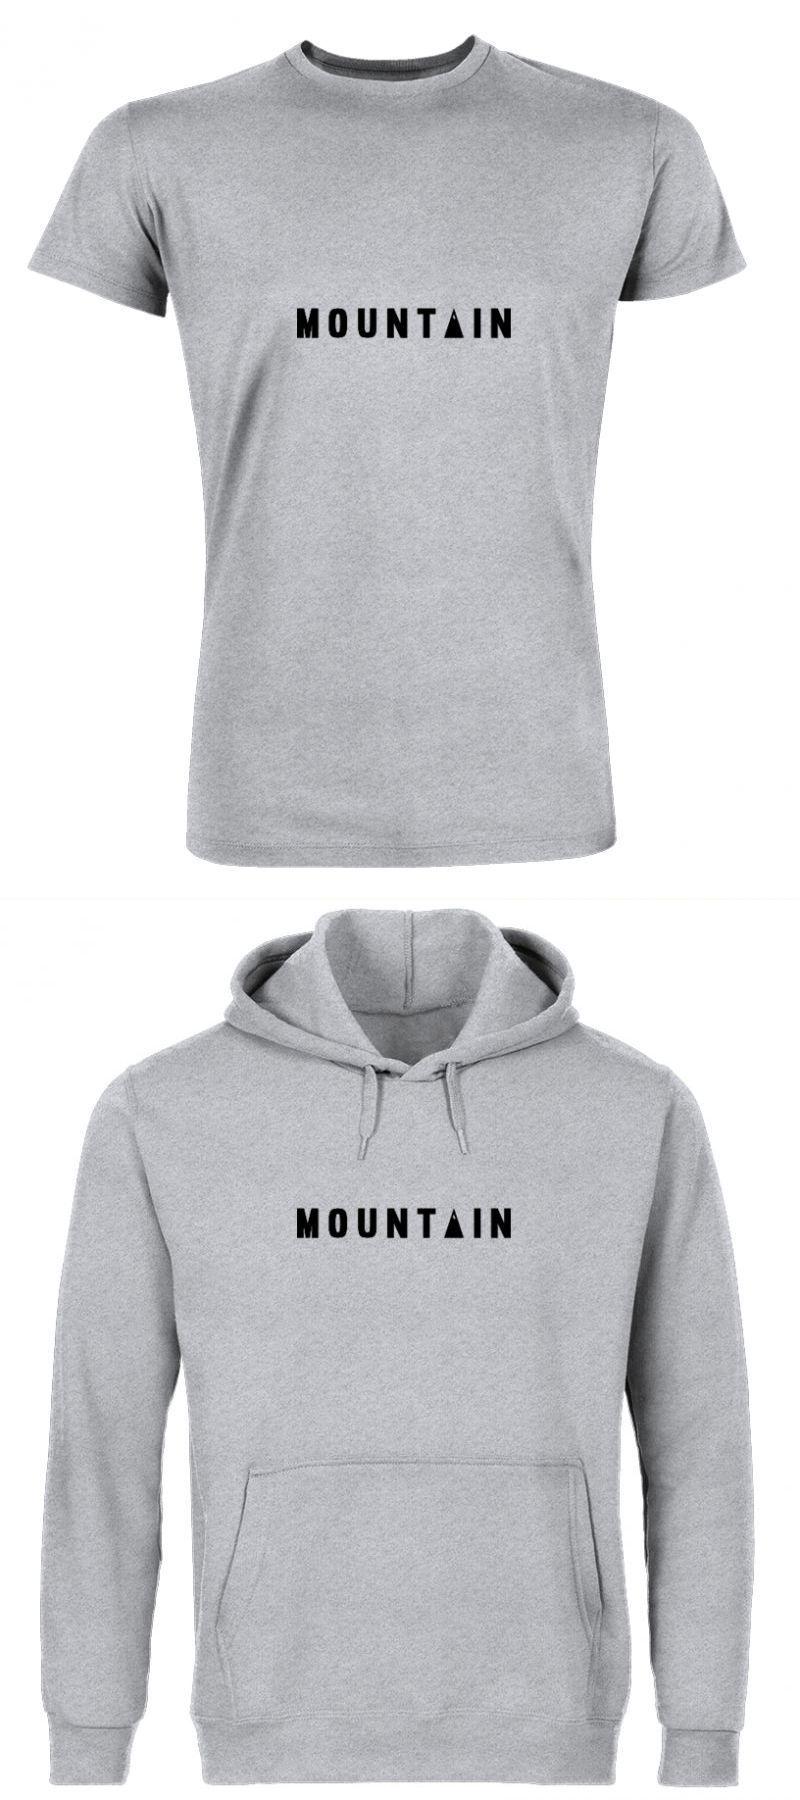 Nike Running T Shirt Womens Mountaintees T Shirt Printing Running